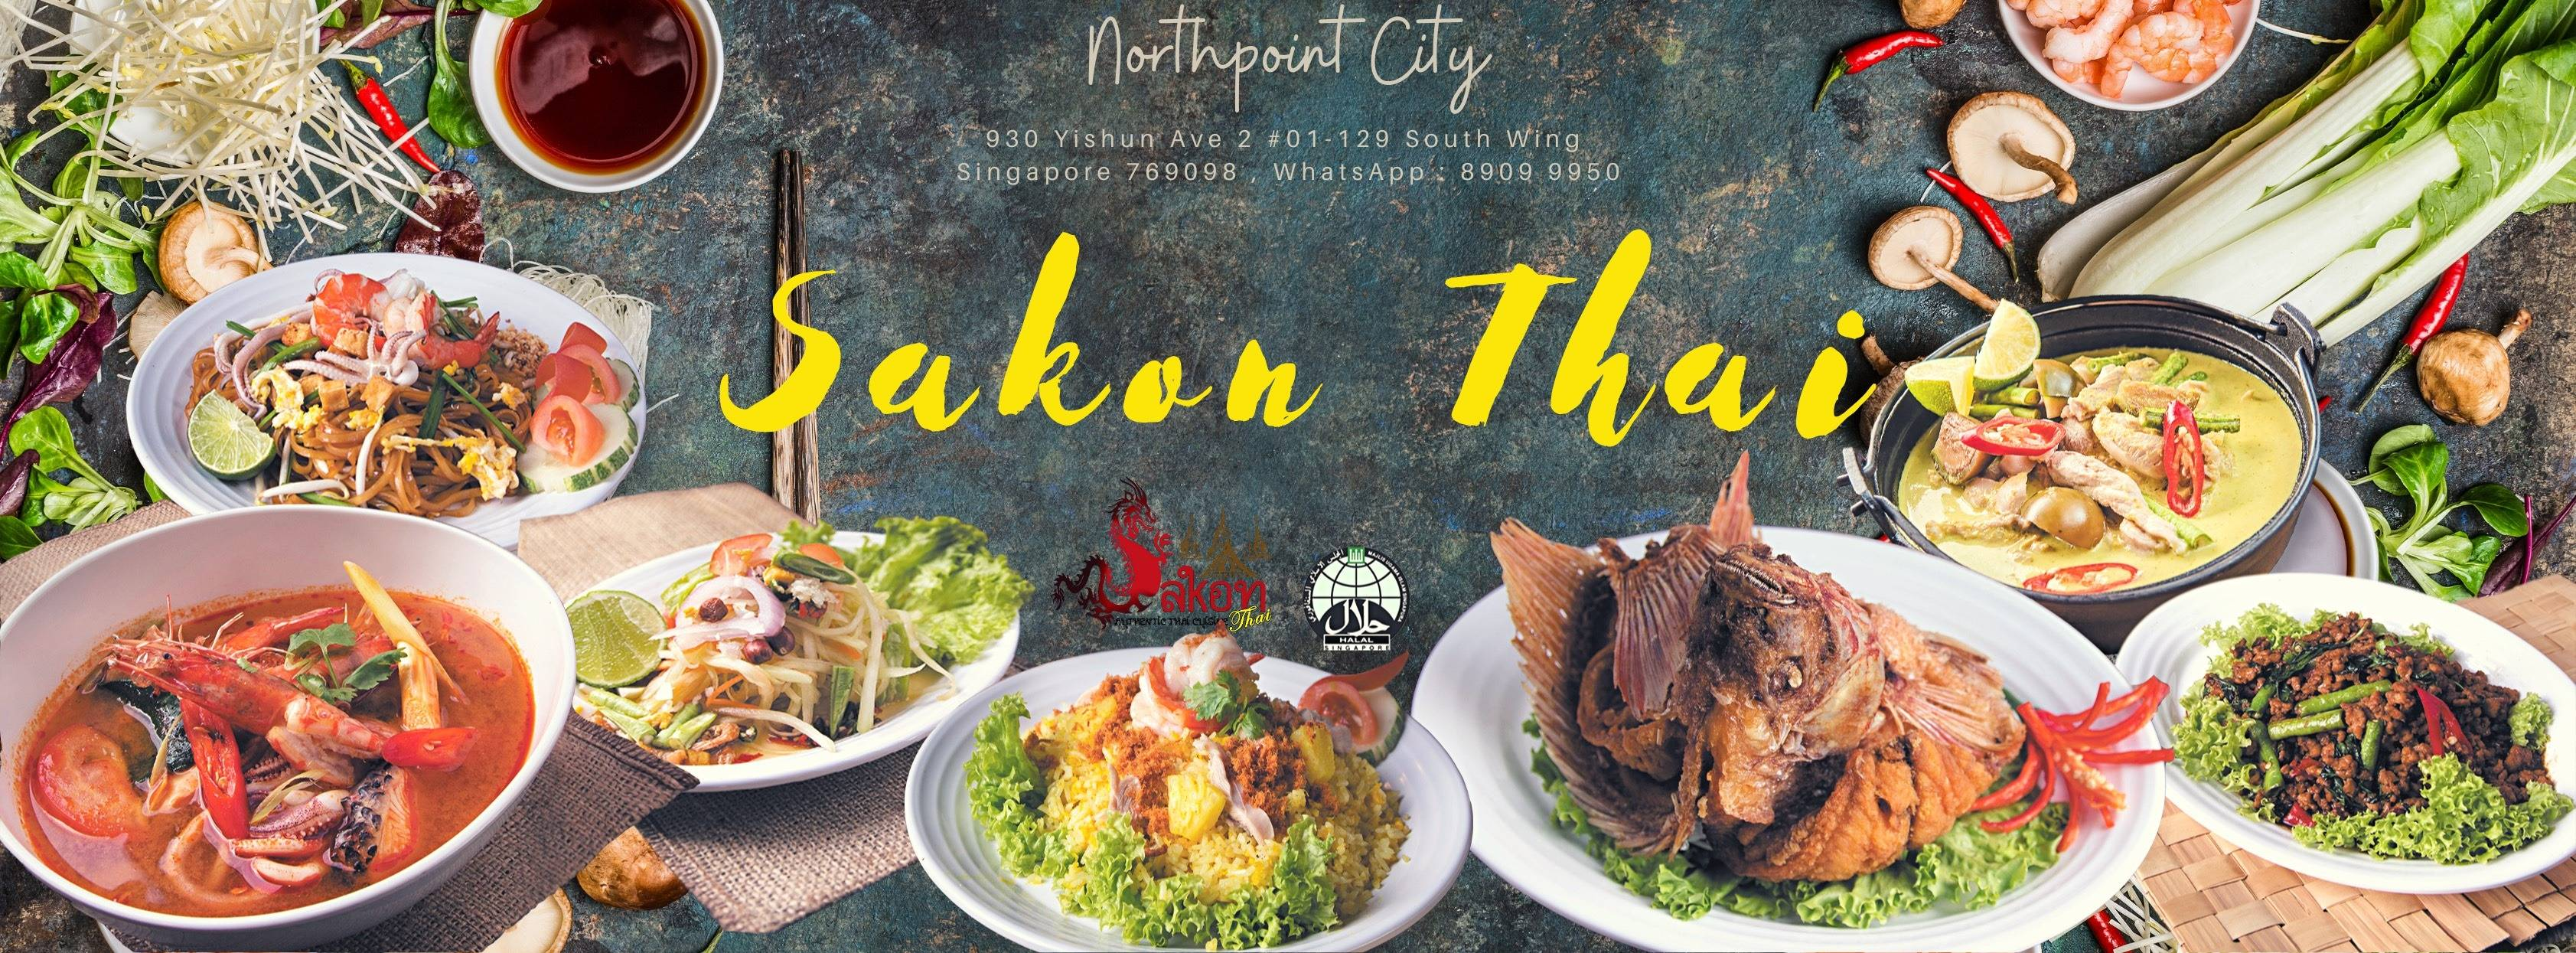 Sakhon Thai Restaurant Halal Singapore